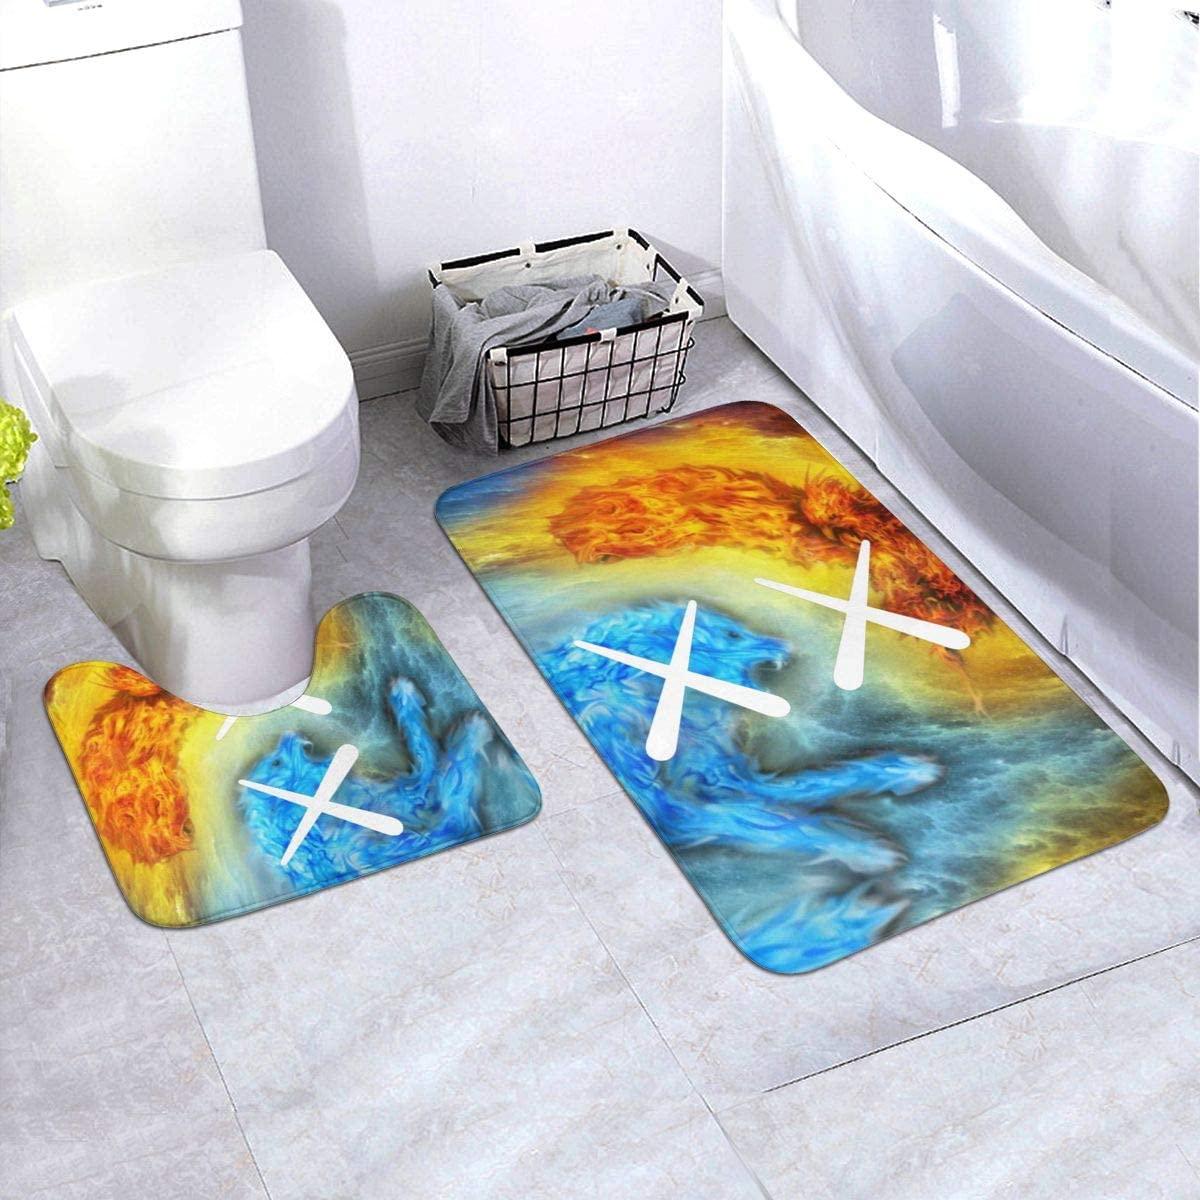 KAWS Bathroom Rug Mats Set 3 Piece Anti-Skid Pads Bath Mat + Contour + Toilet Lid Cover Bathroom Antiskid Pad 19.5in X 31.5in